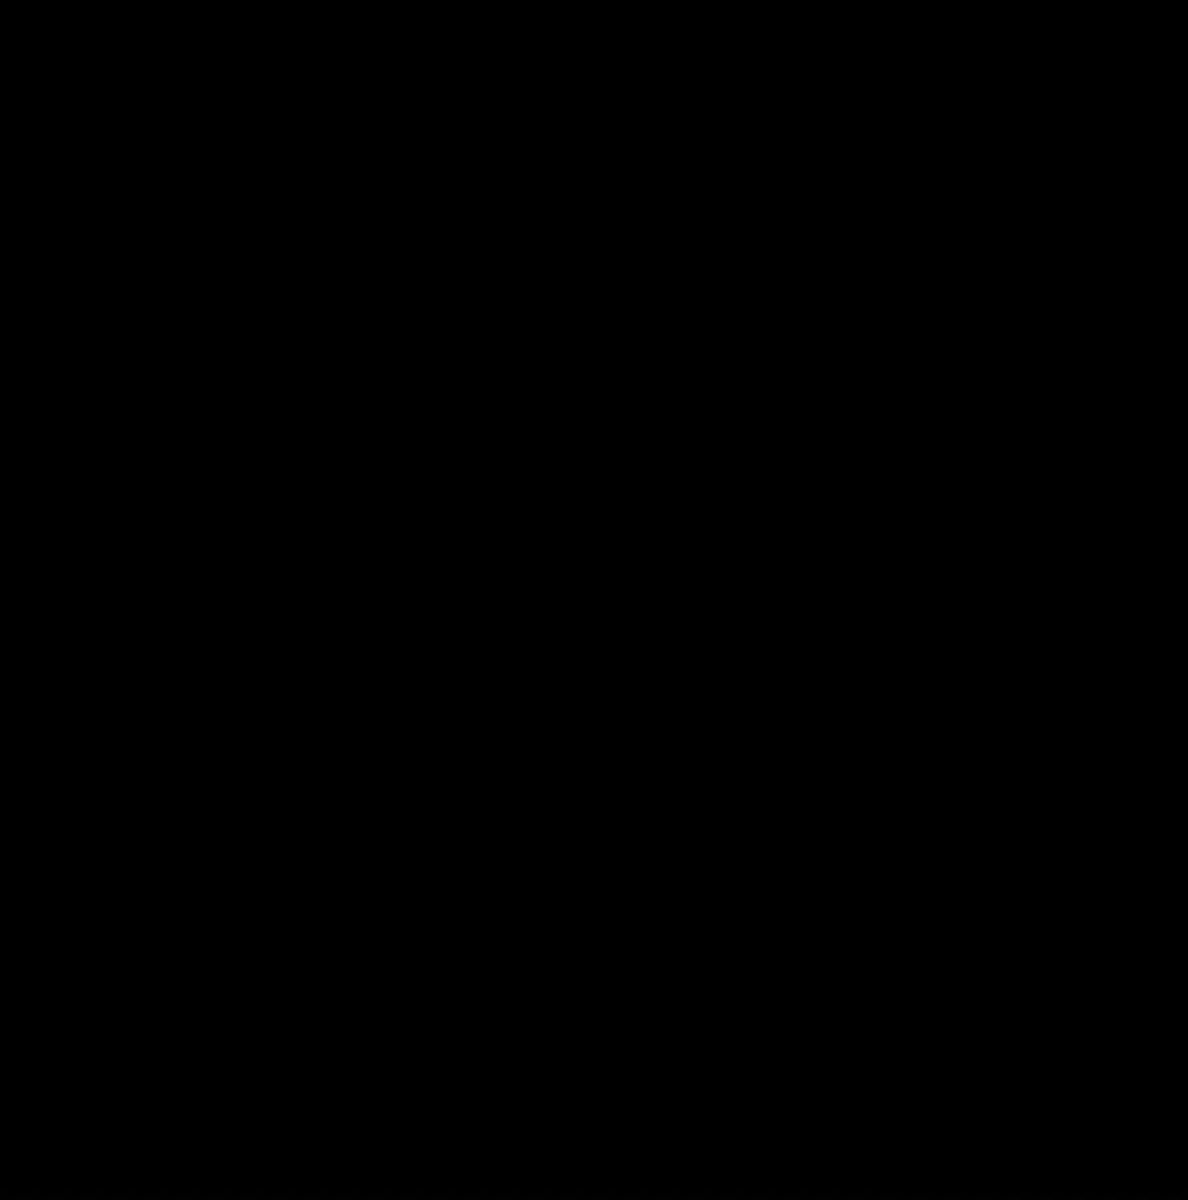 #blackouttuesday https://t.co/hOVaLMXWtv